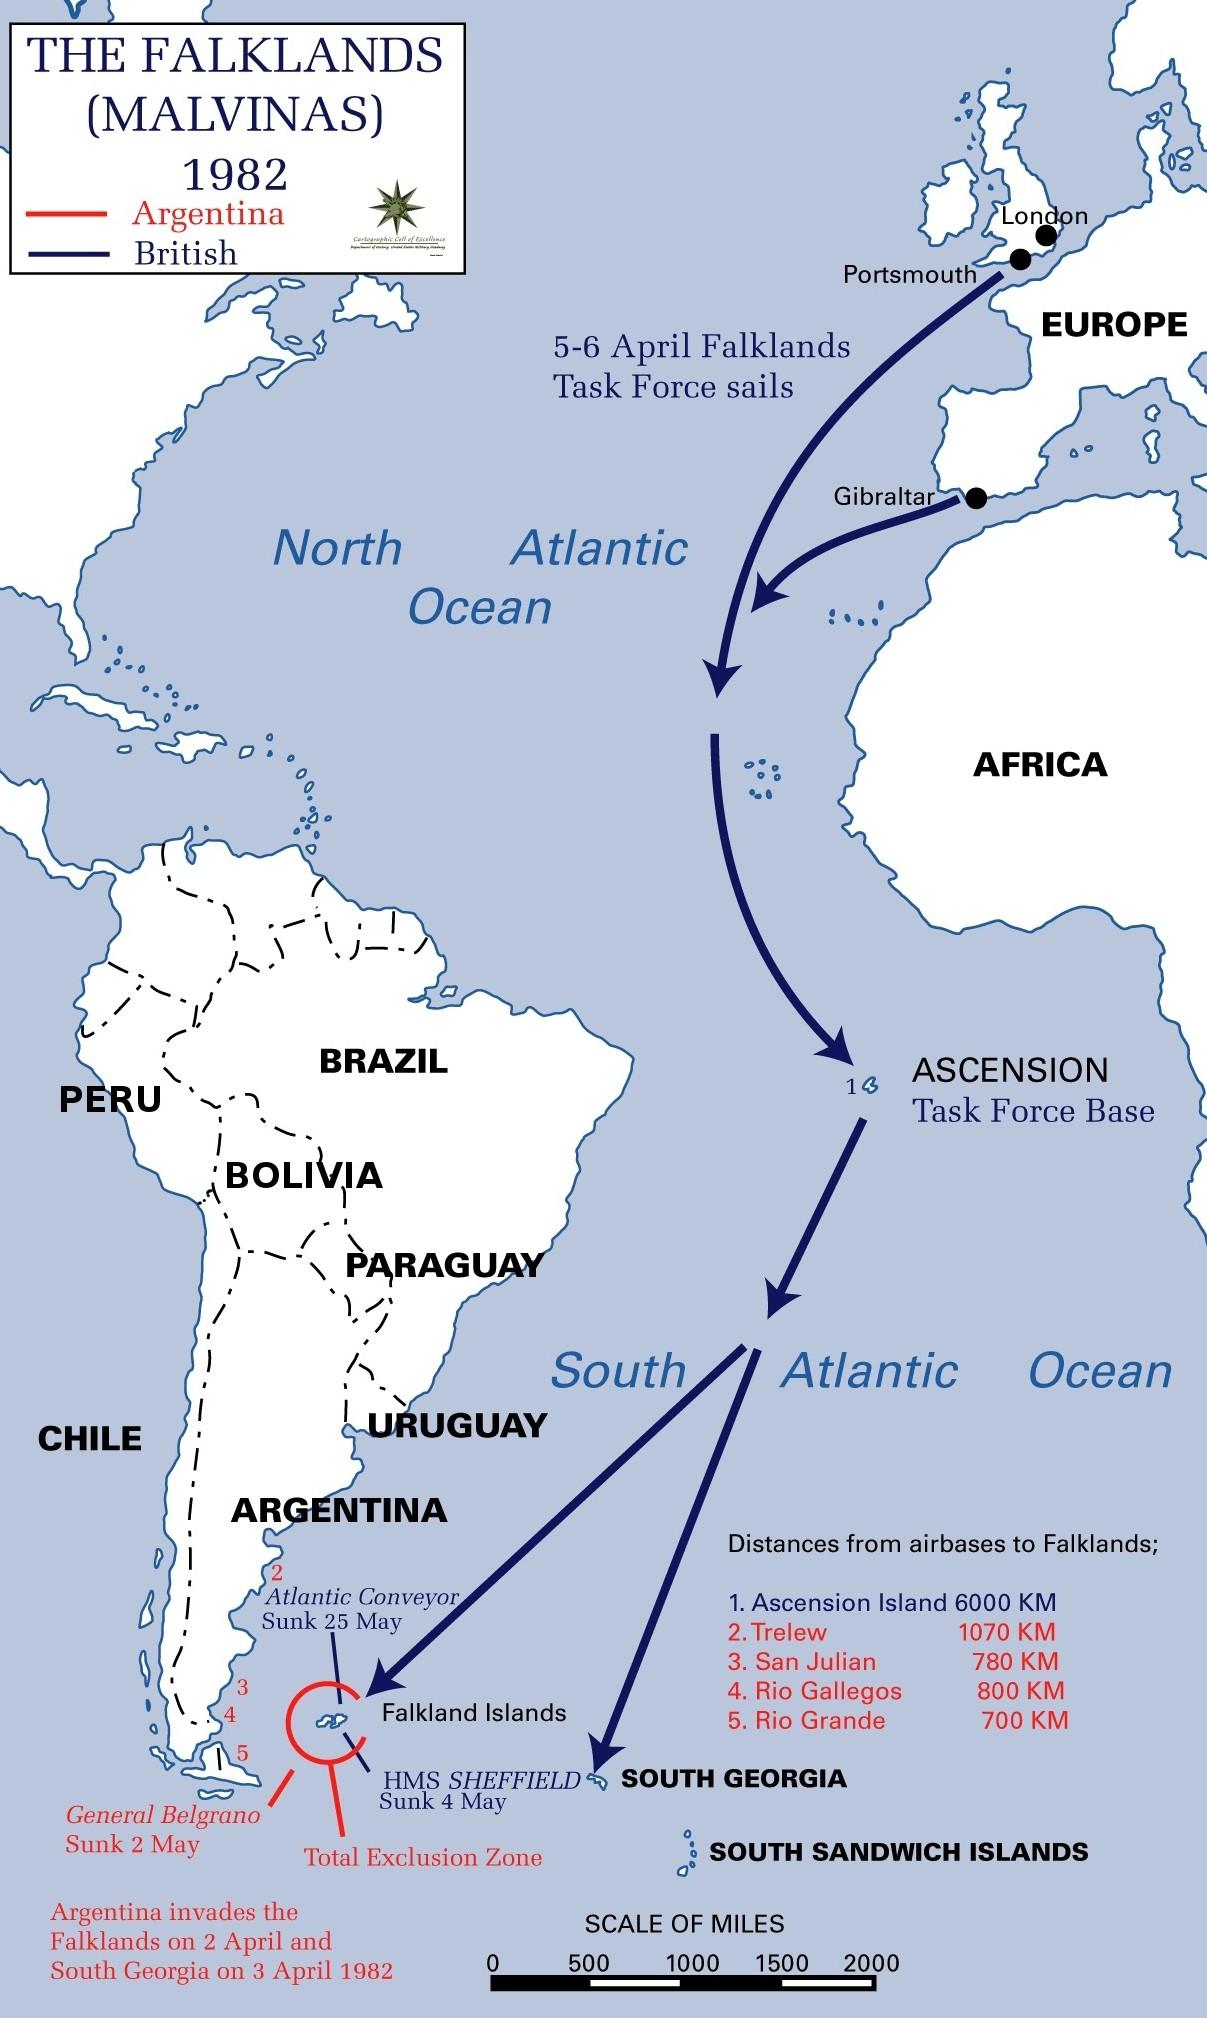 أسلحة صنعت الحدث - صفحة 3 Falklands%2C_Campaign%2C_%28Distances_to_bases%29_1982